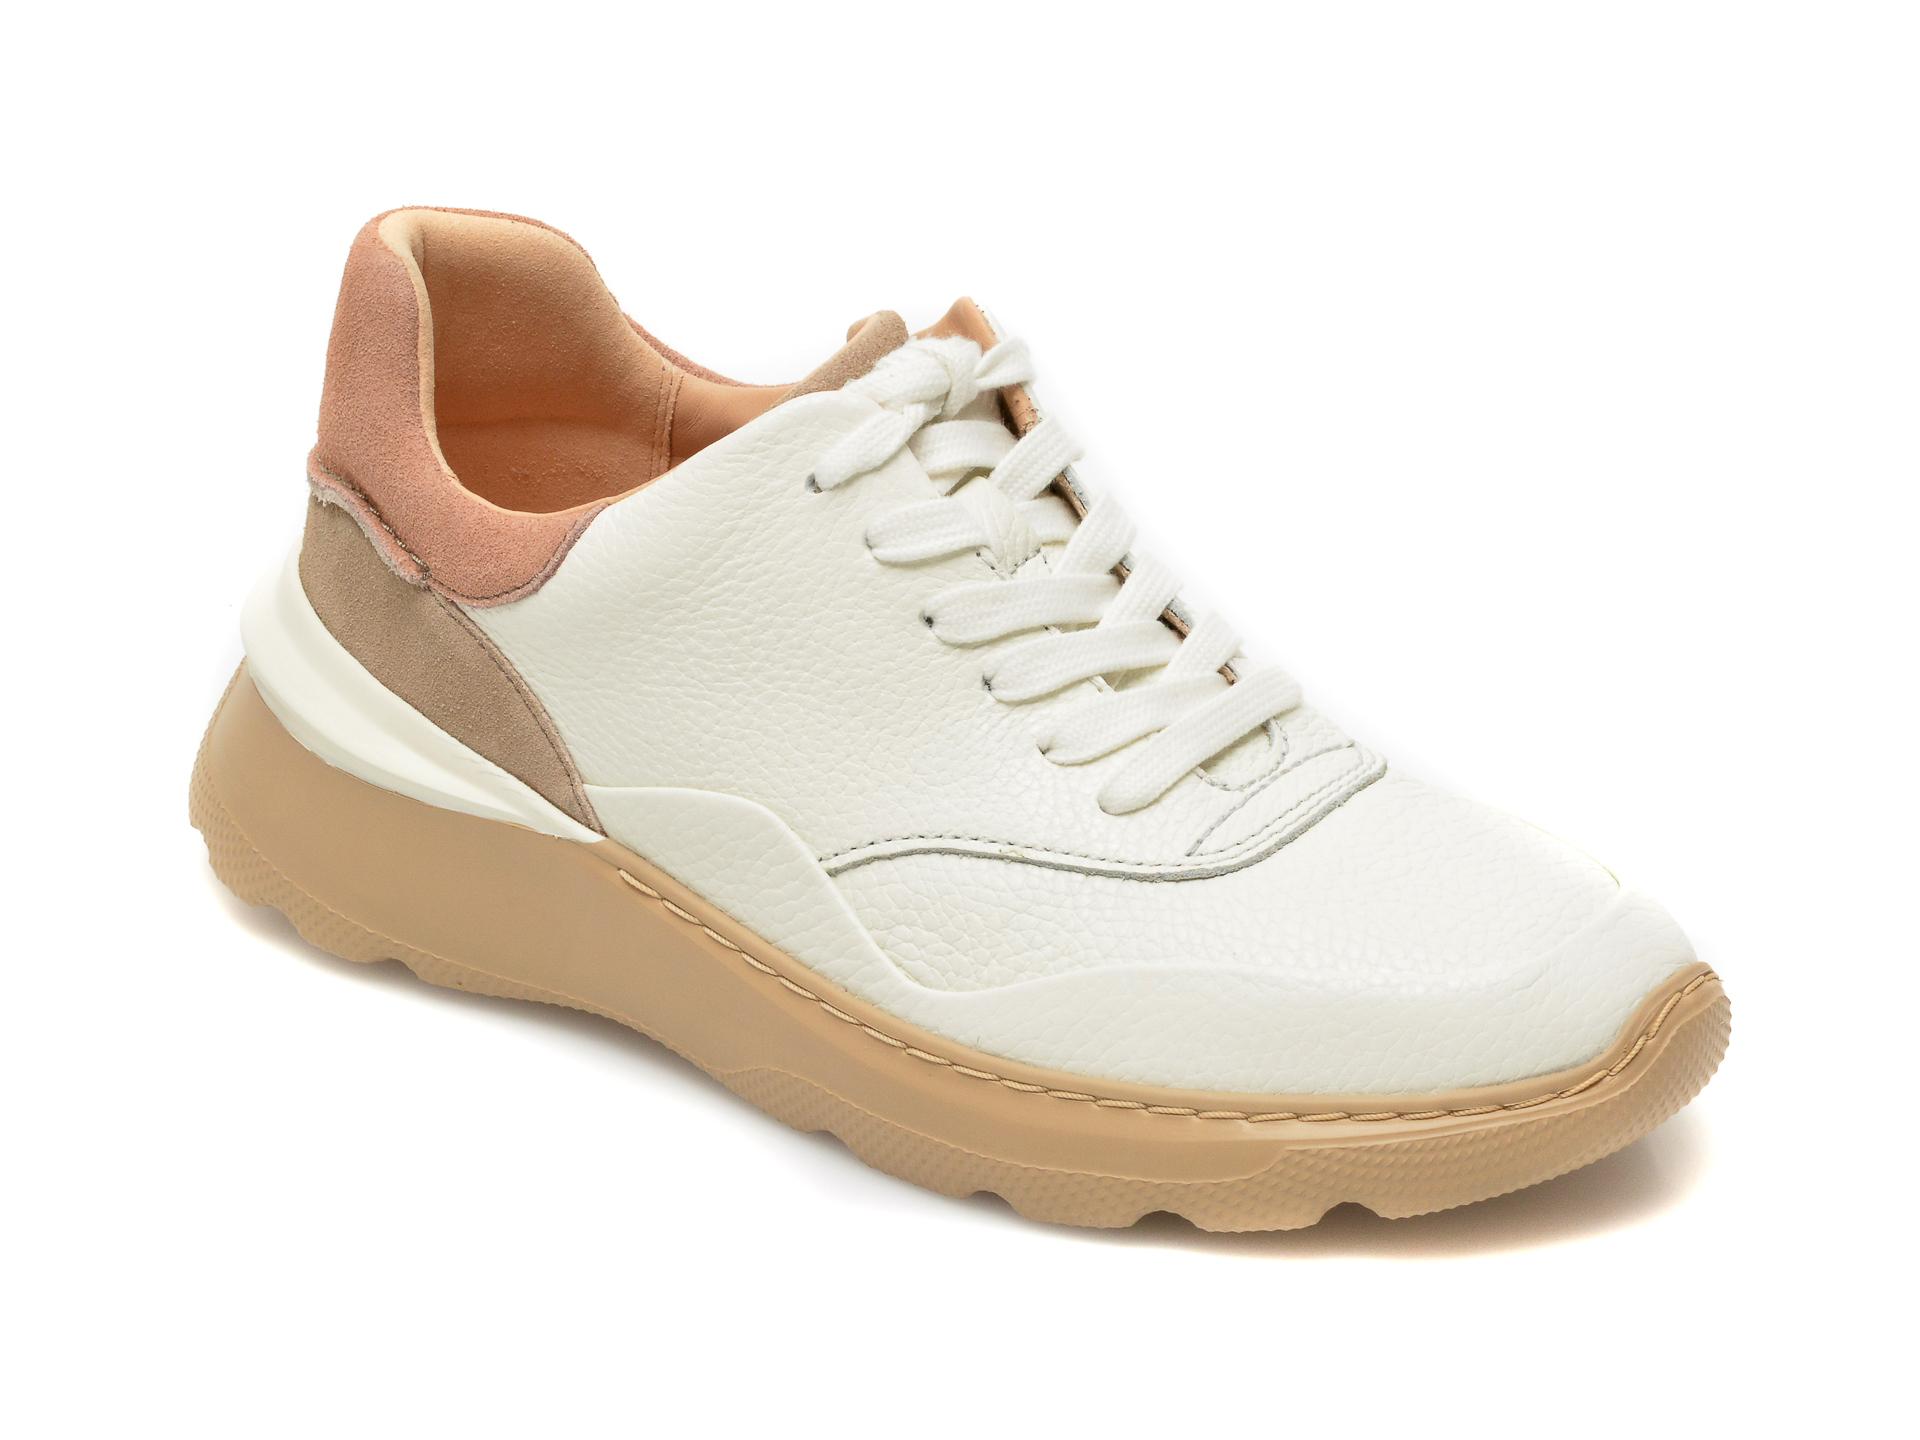 Pantofi CLARKS albi, Sprintlitelace, din piele naturala imagine otter.ro 2021